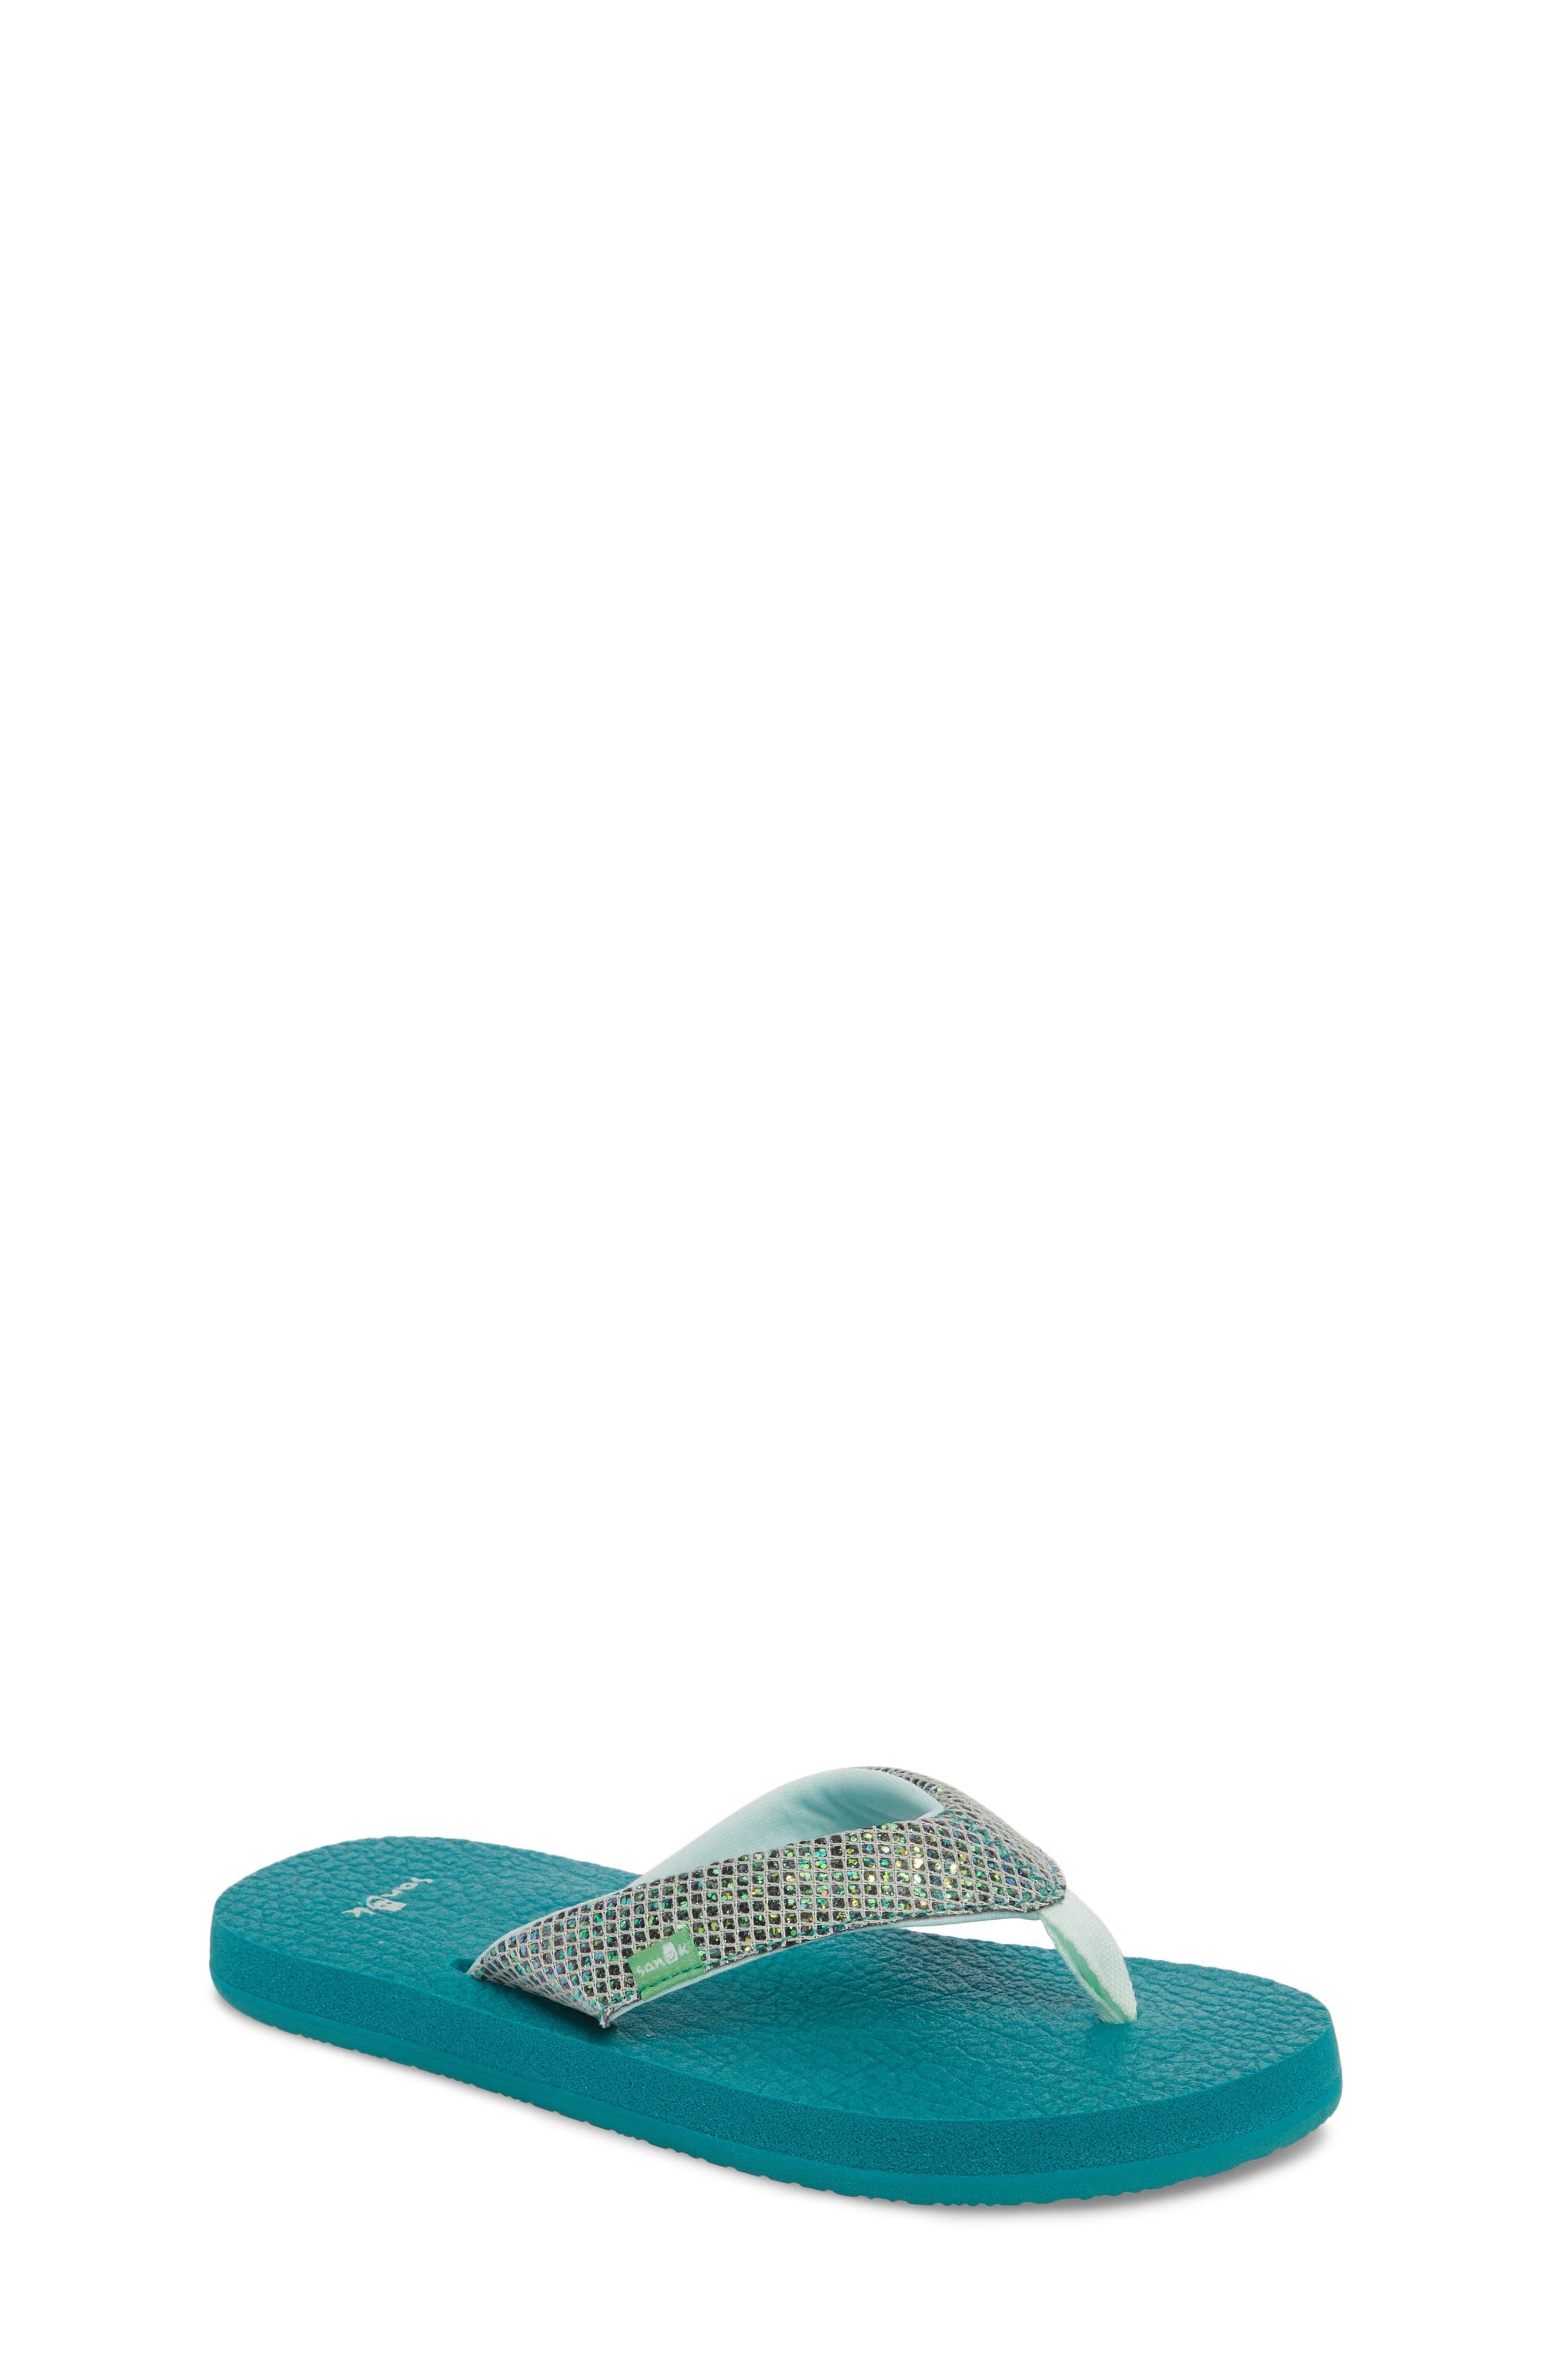 'Yoga' Glitter Sandal,                             Main thumbnail 1, color,                             SEA GREEN